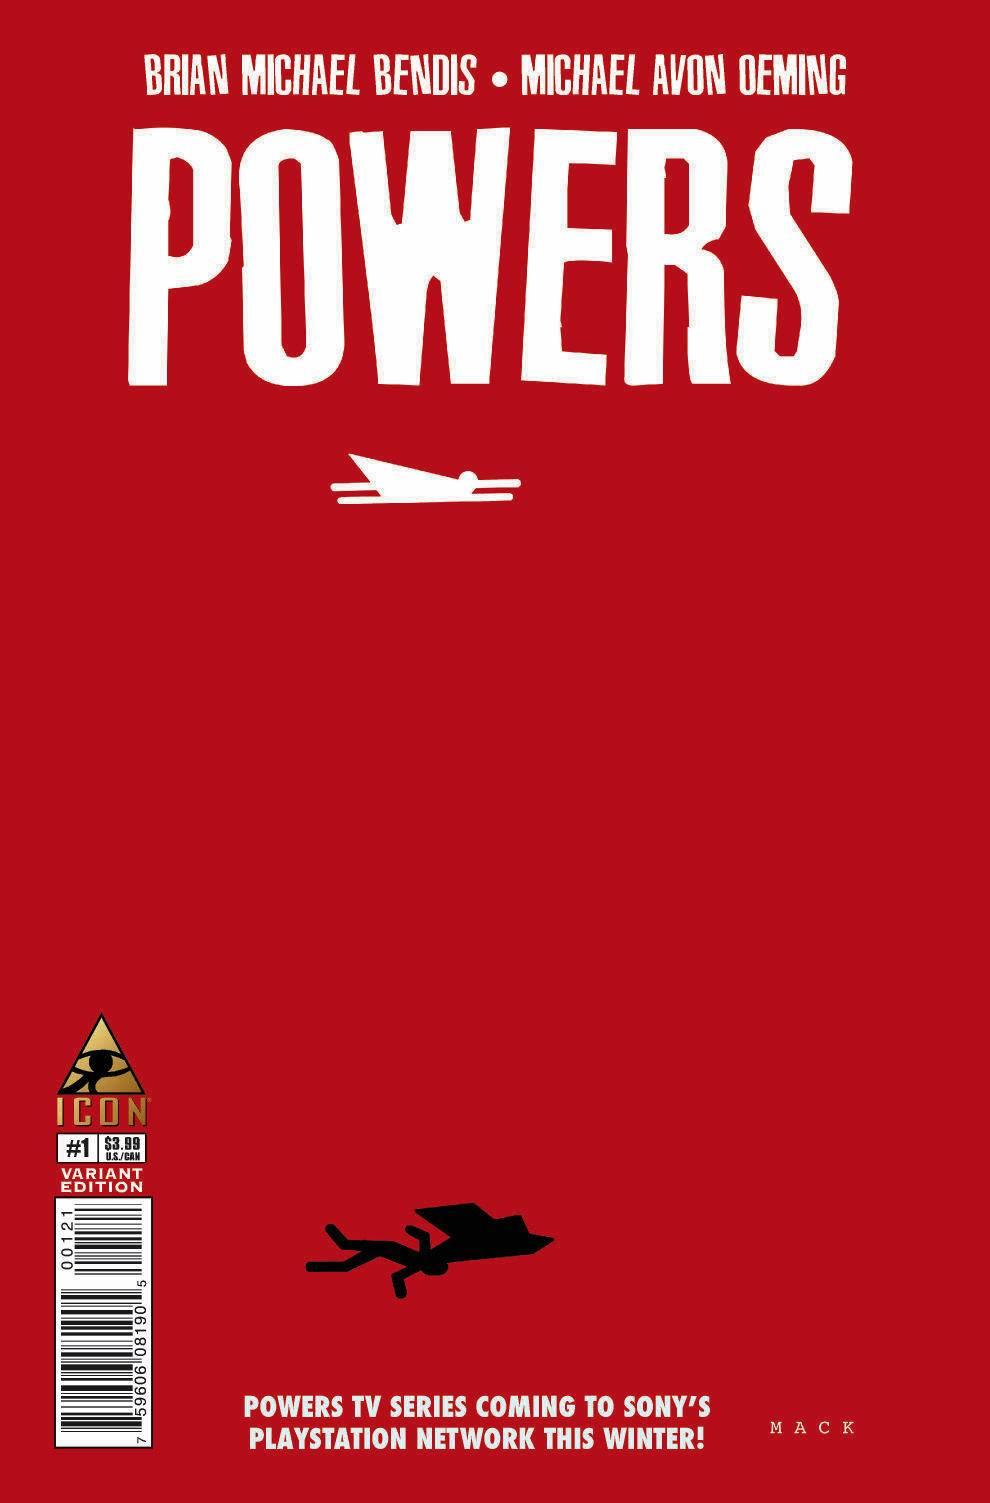 powers1cvr